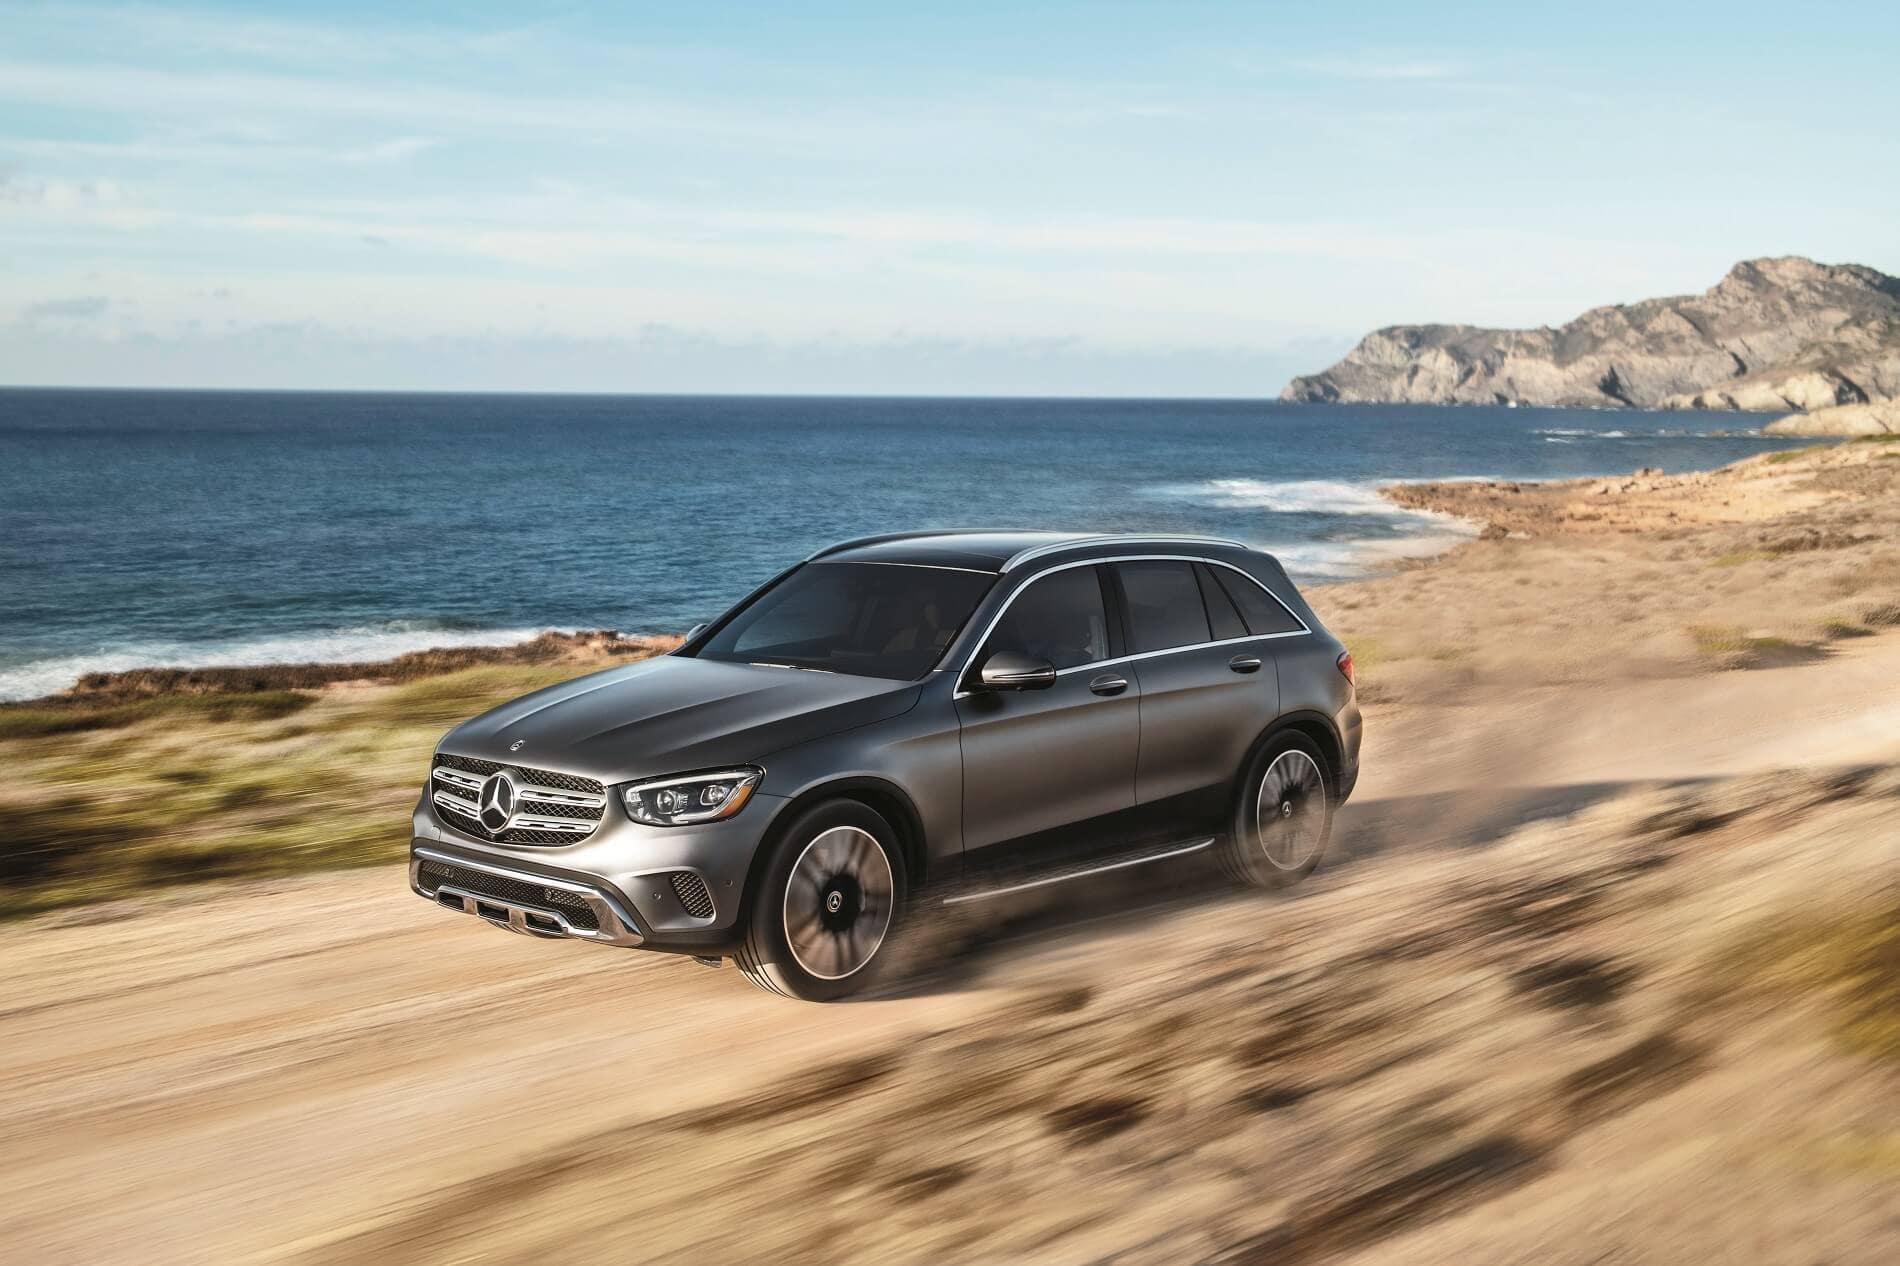 2020 Mercedes GLC in Silver